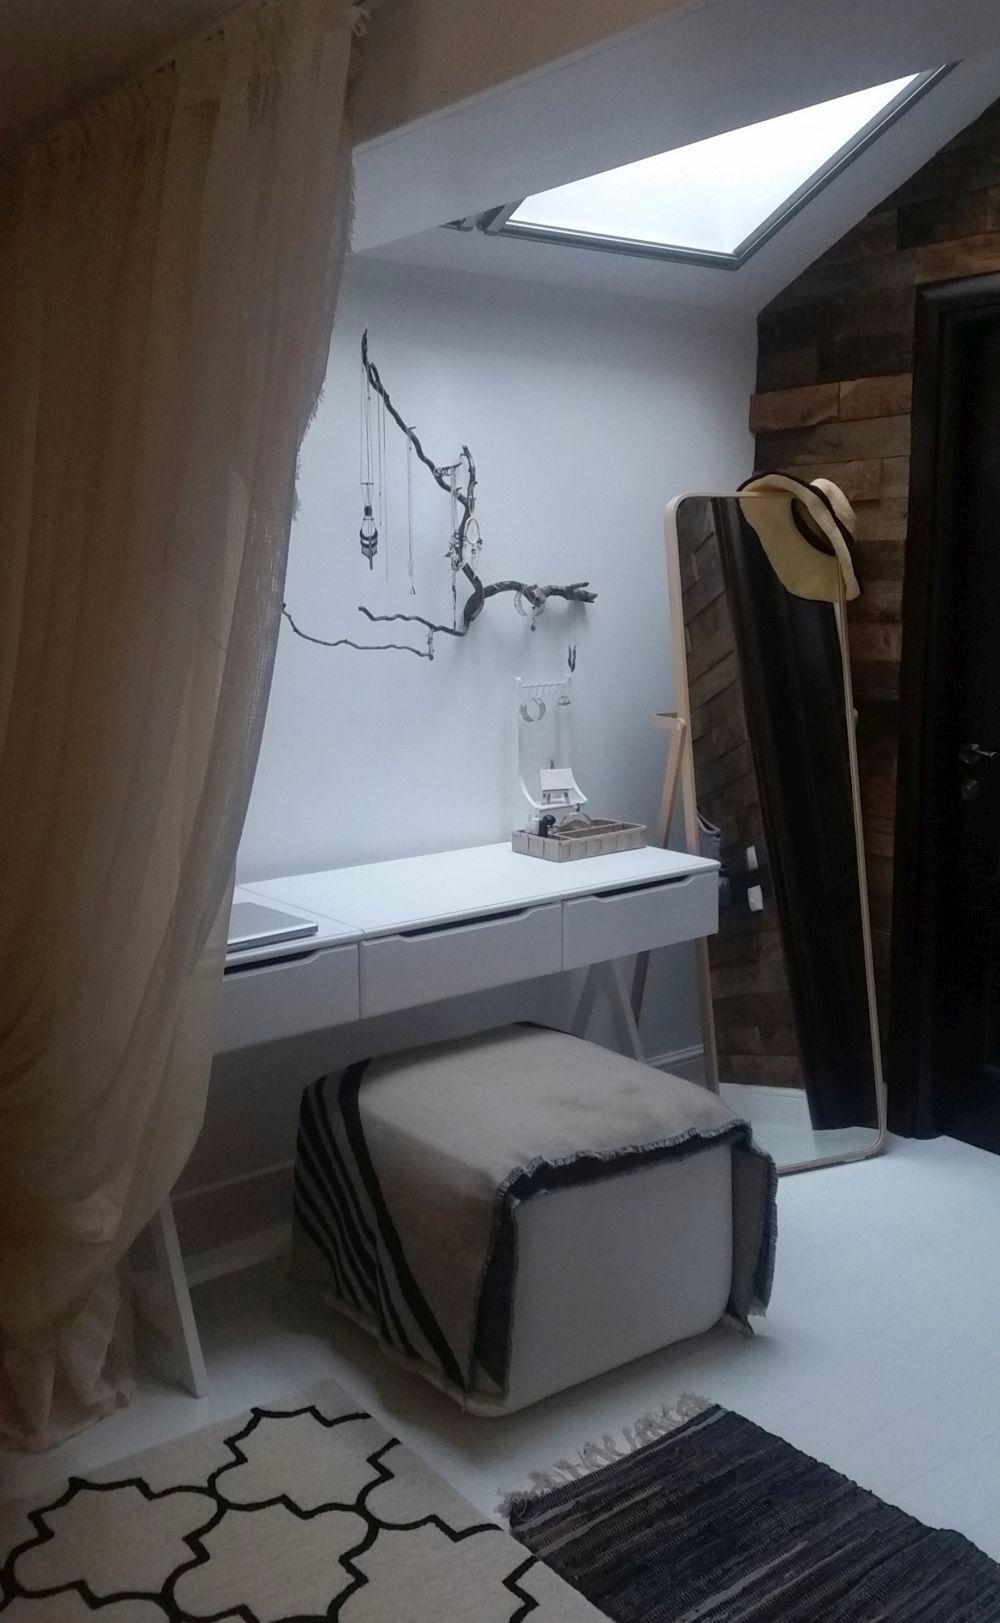 adelaparvu.com despre amenajare camera adolescenta Bucuresti, Romania, stil BoHo chic, Designer Adela Parvu, Foto Adela Parvu (16)